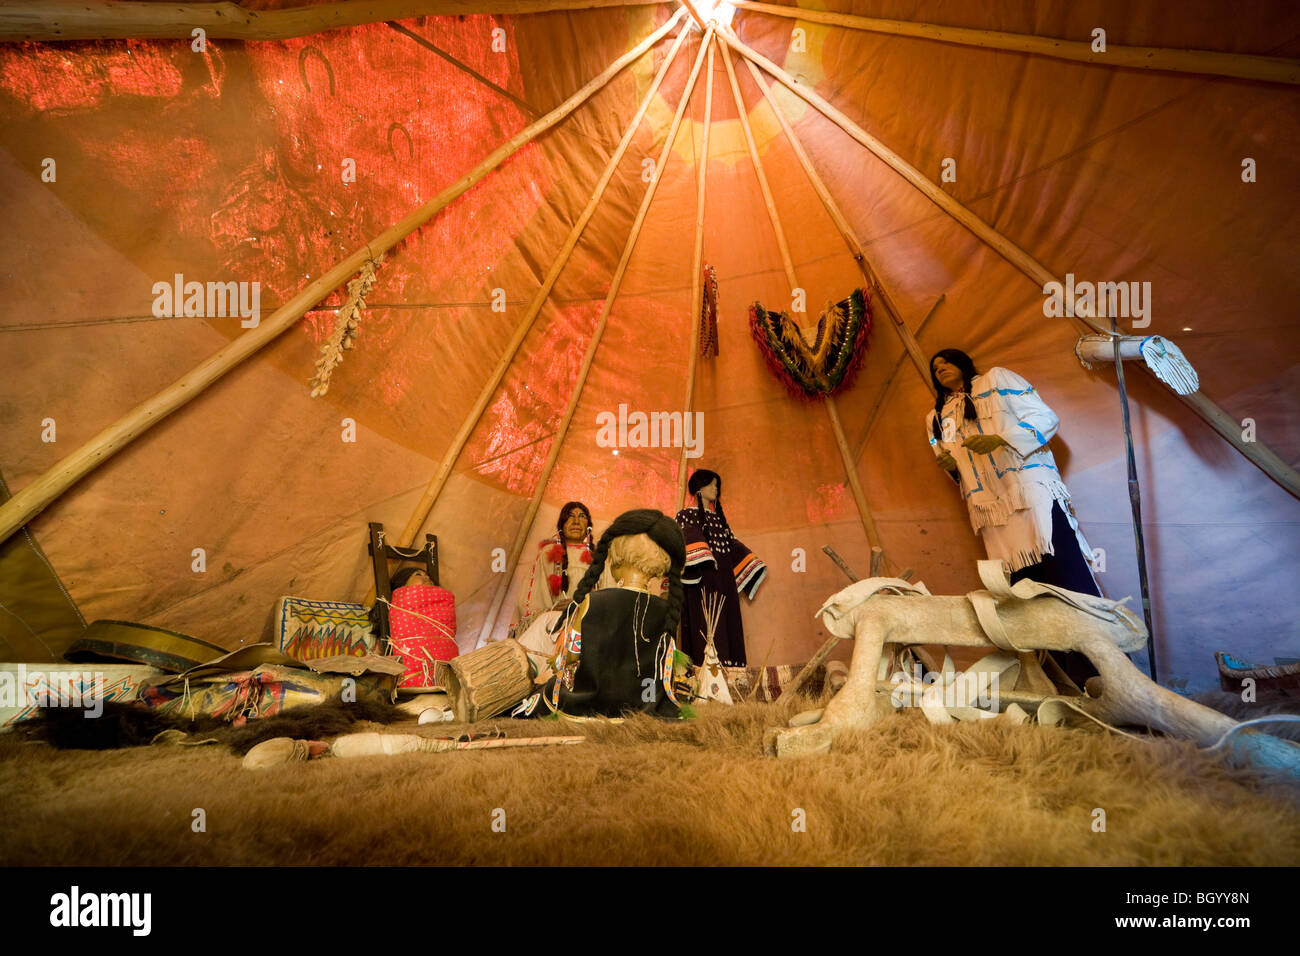 Inside a Lakota, Native American Tipi, Tepee, Teepee. Museum exhibit, display, at Crazy Horse Memorial, South Dakota. - Stock Image